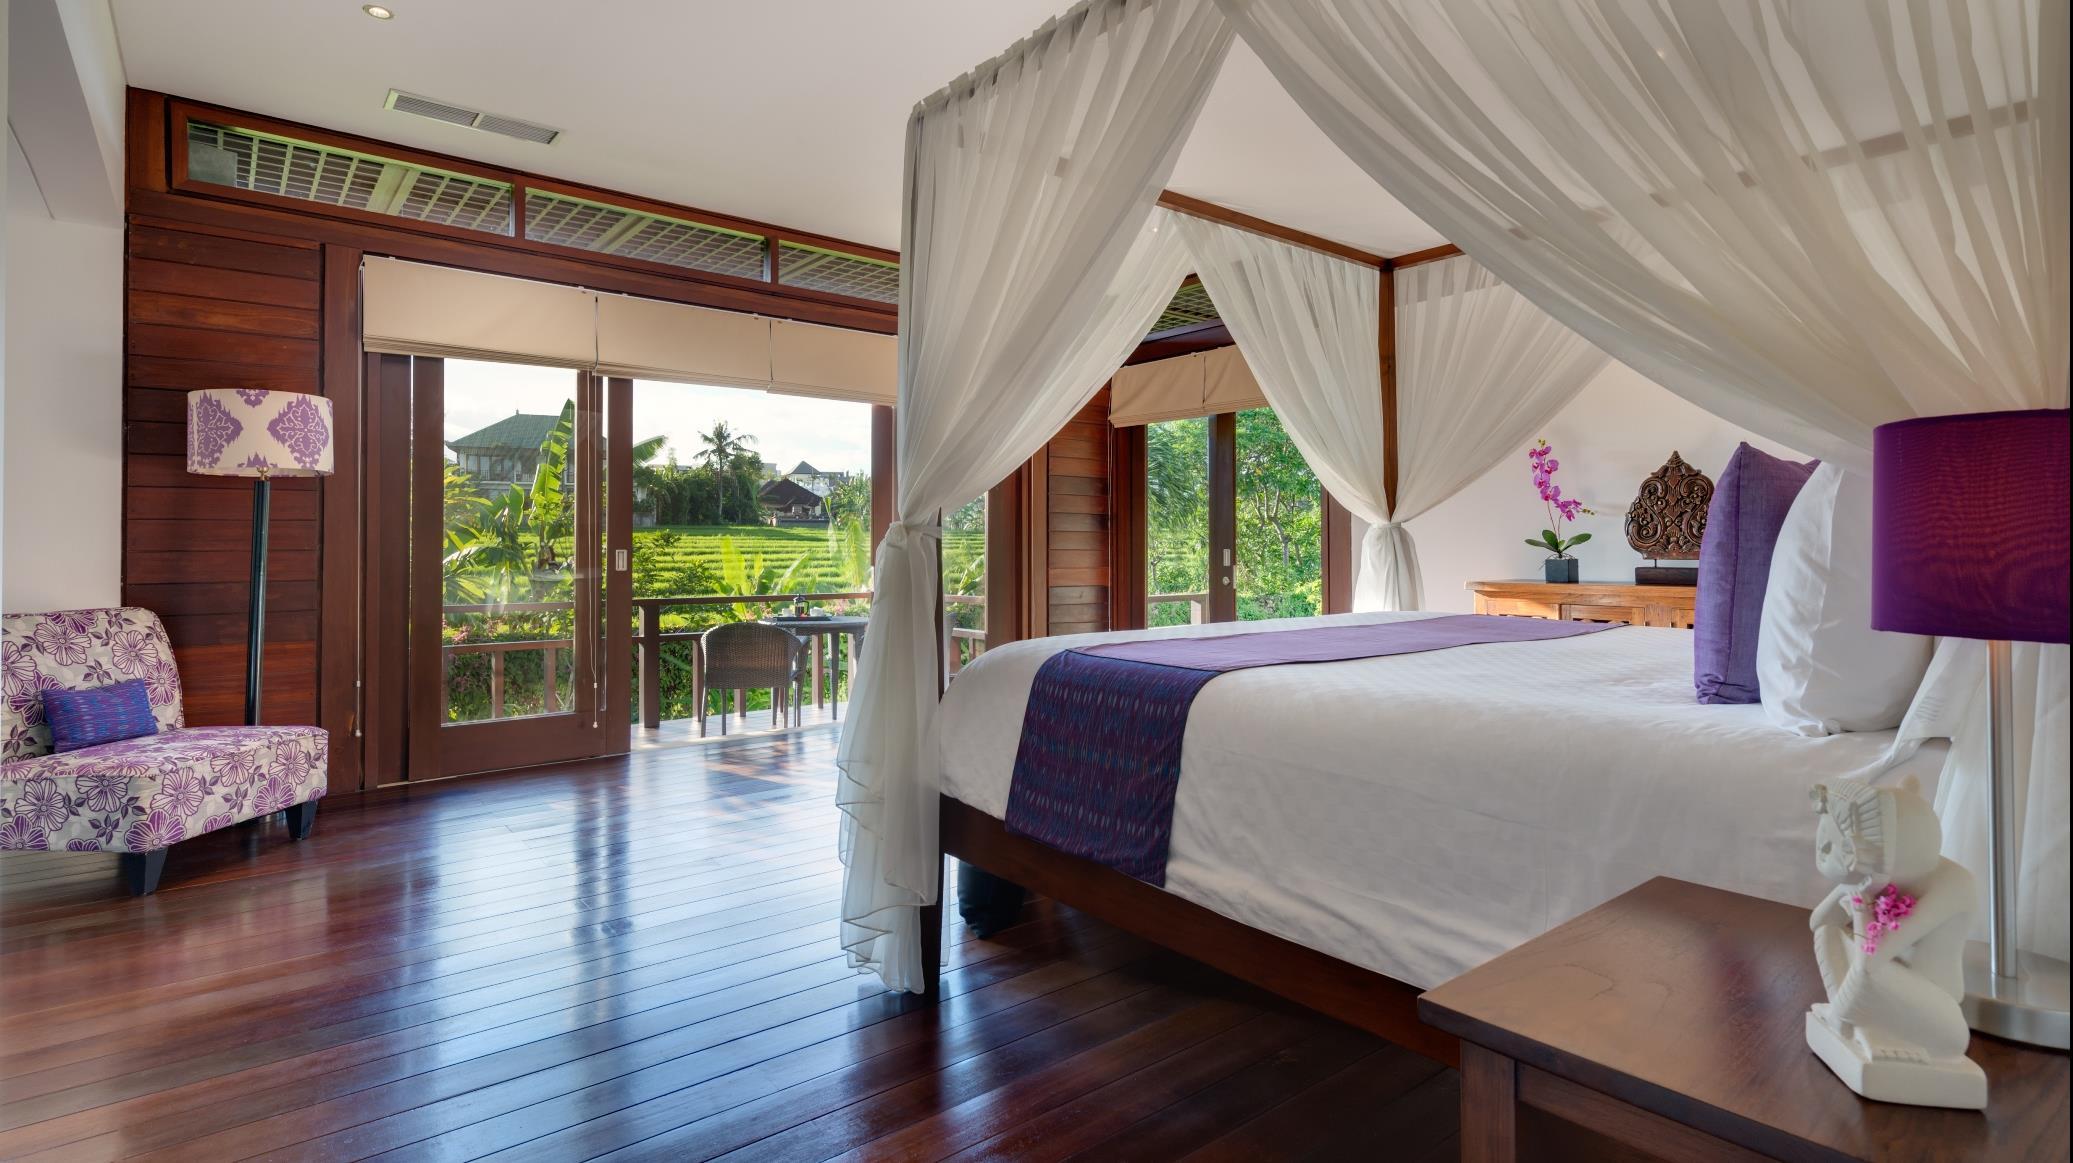 Bedroom and Balcony - Villa Bendega Nui - Canggu, Bali